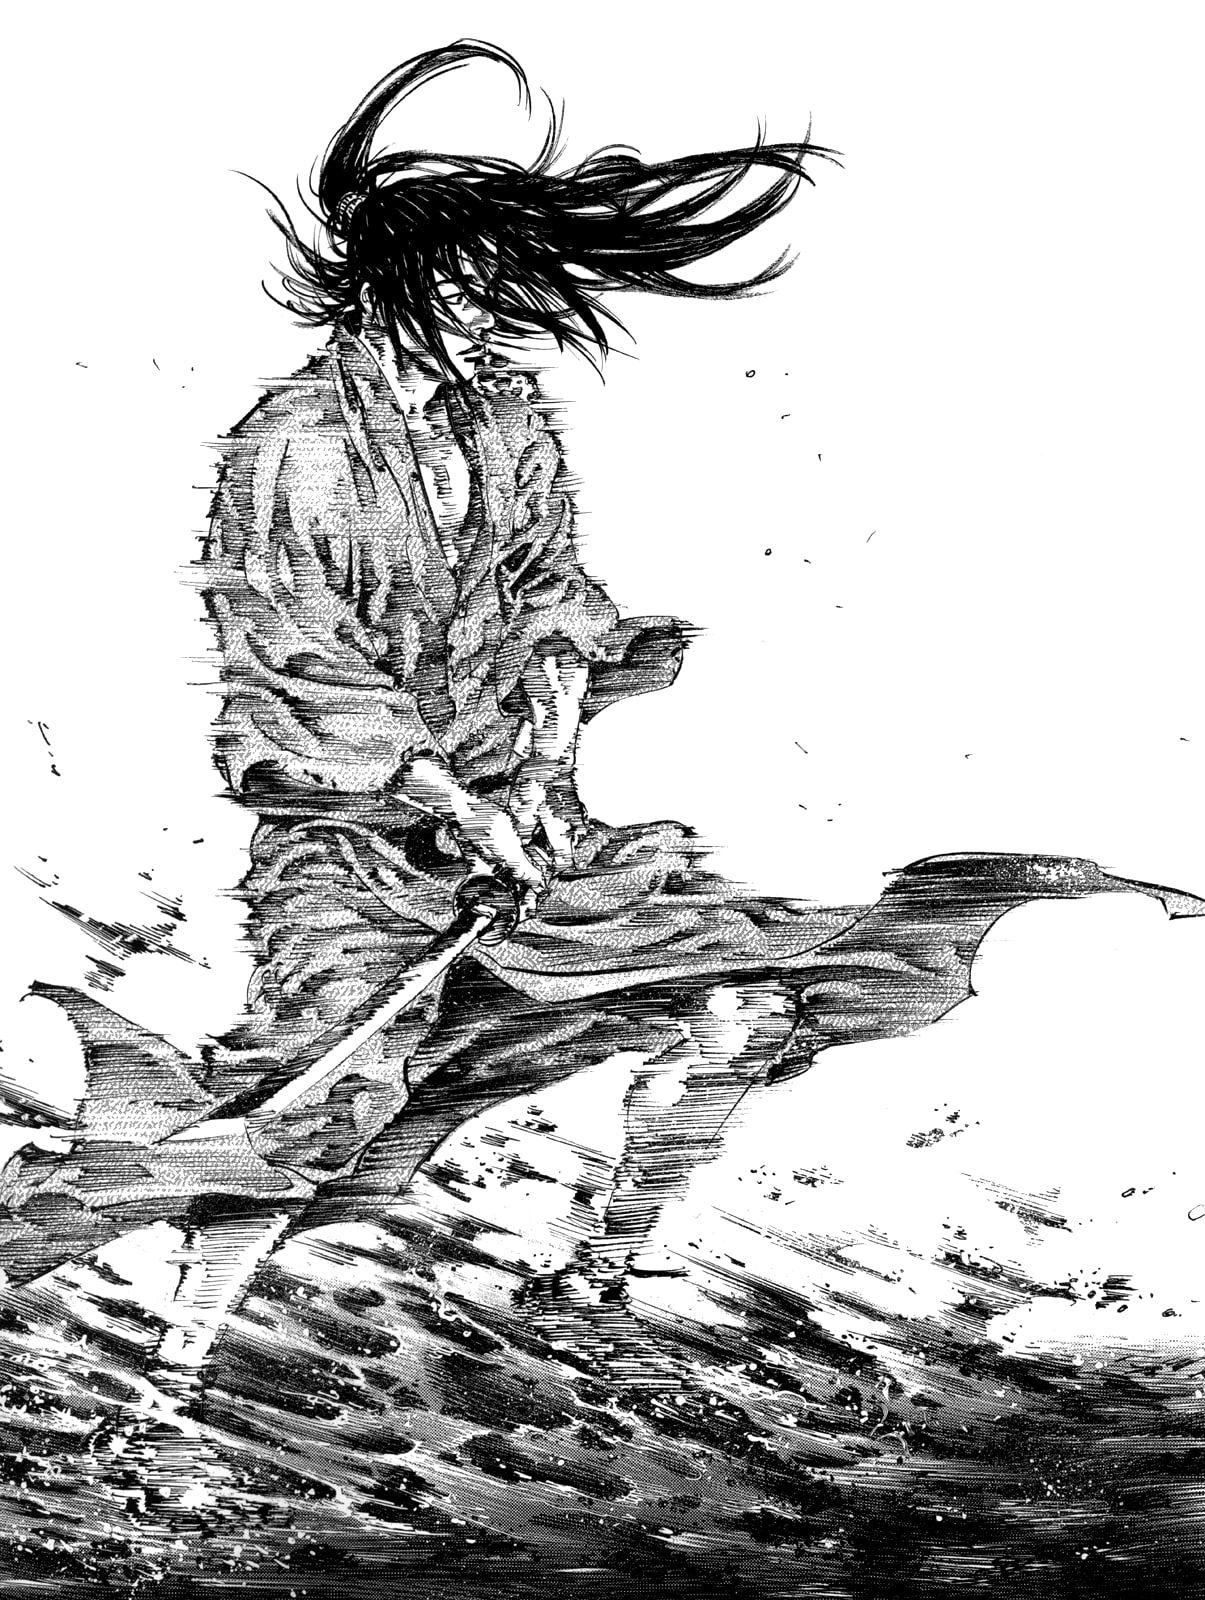 Vagabond Takehiko Inoue Vagabond Sumi Samurai Sword 720p